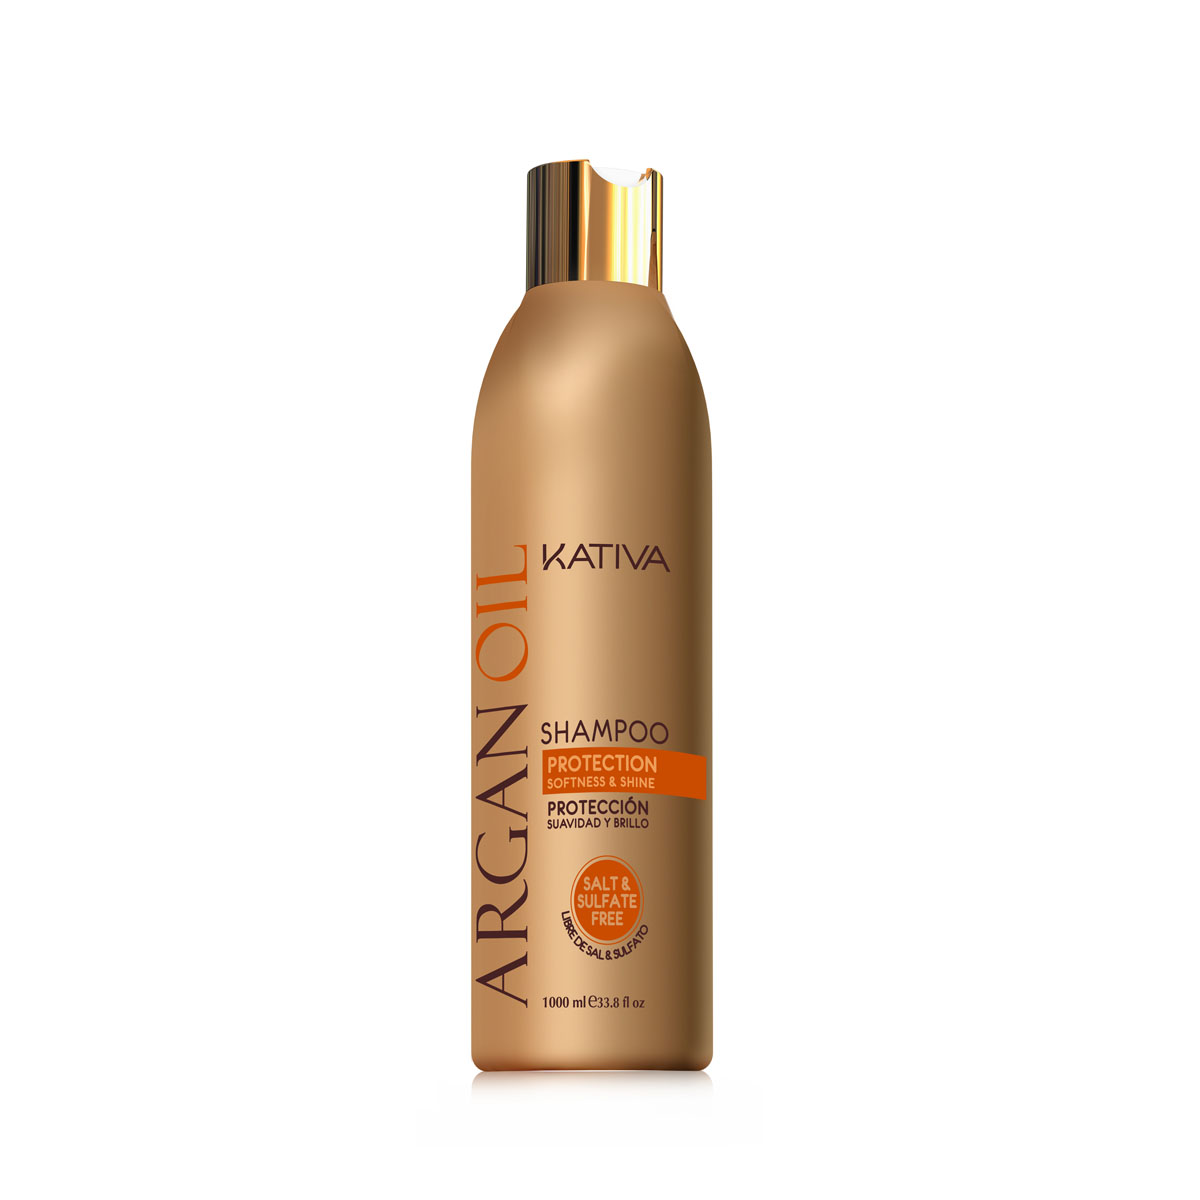 Kativa ARGANA Увлажняющий шампунь с маслом Арганы 250 мл 911 7979 002